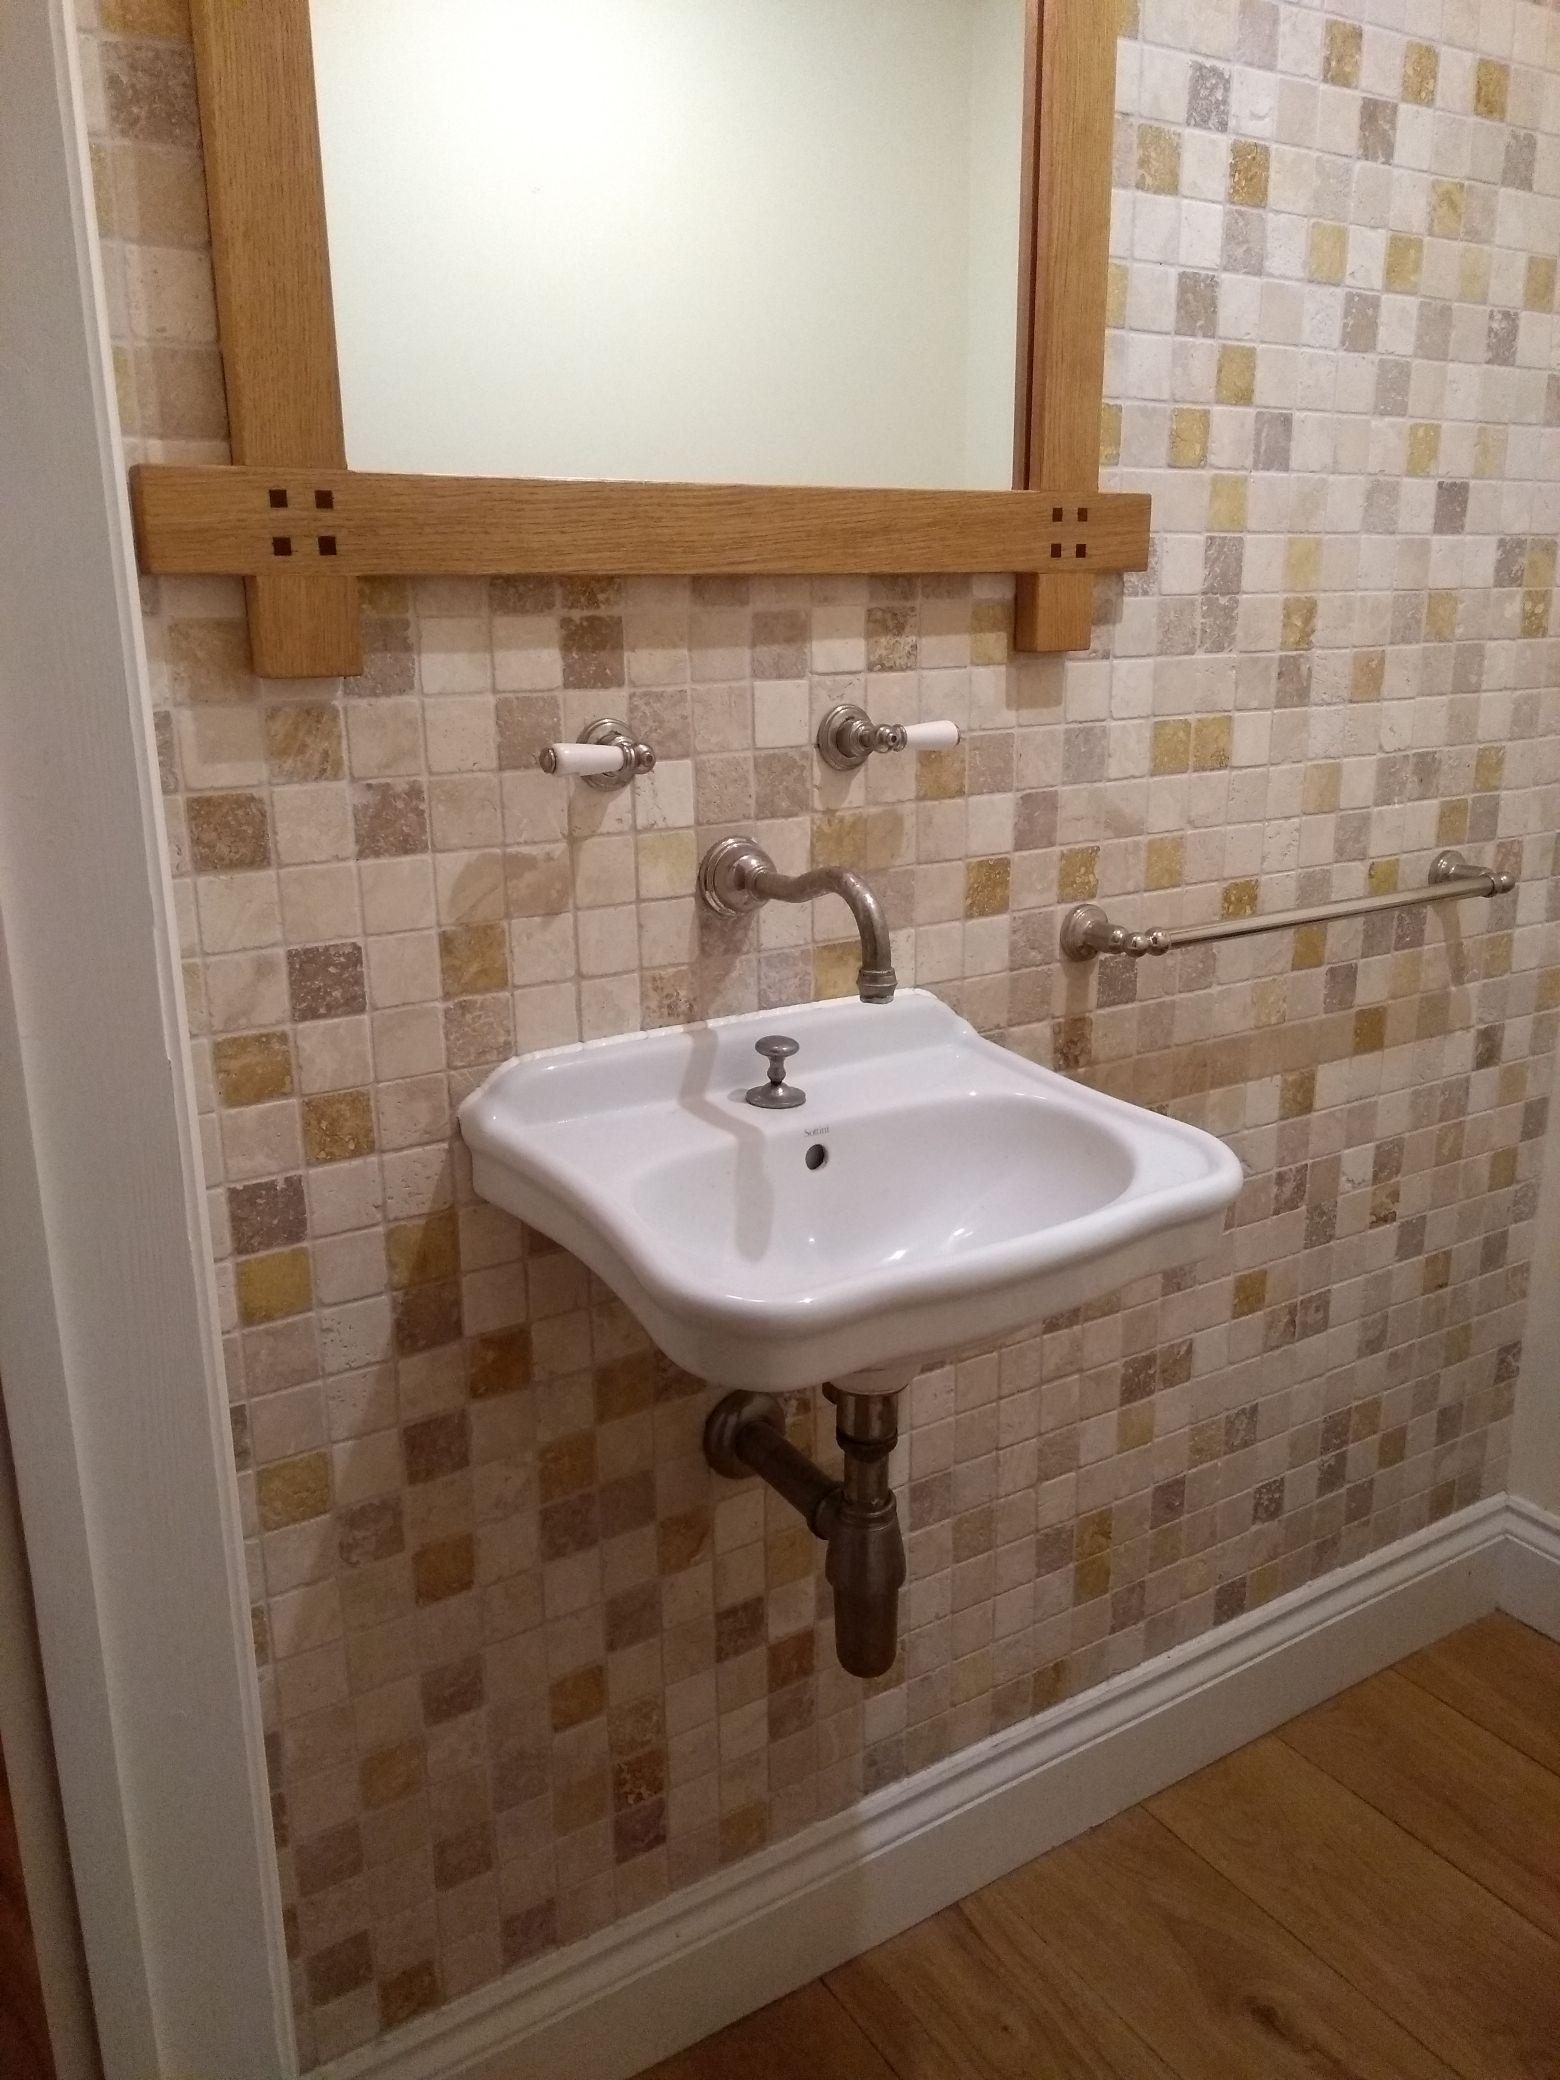 Wall hung basin - do I need a frame? - Bathrooms, Ensuites ... | 1560 x 2080 jpeg 339kB